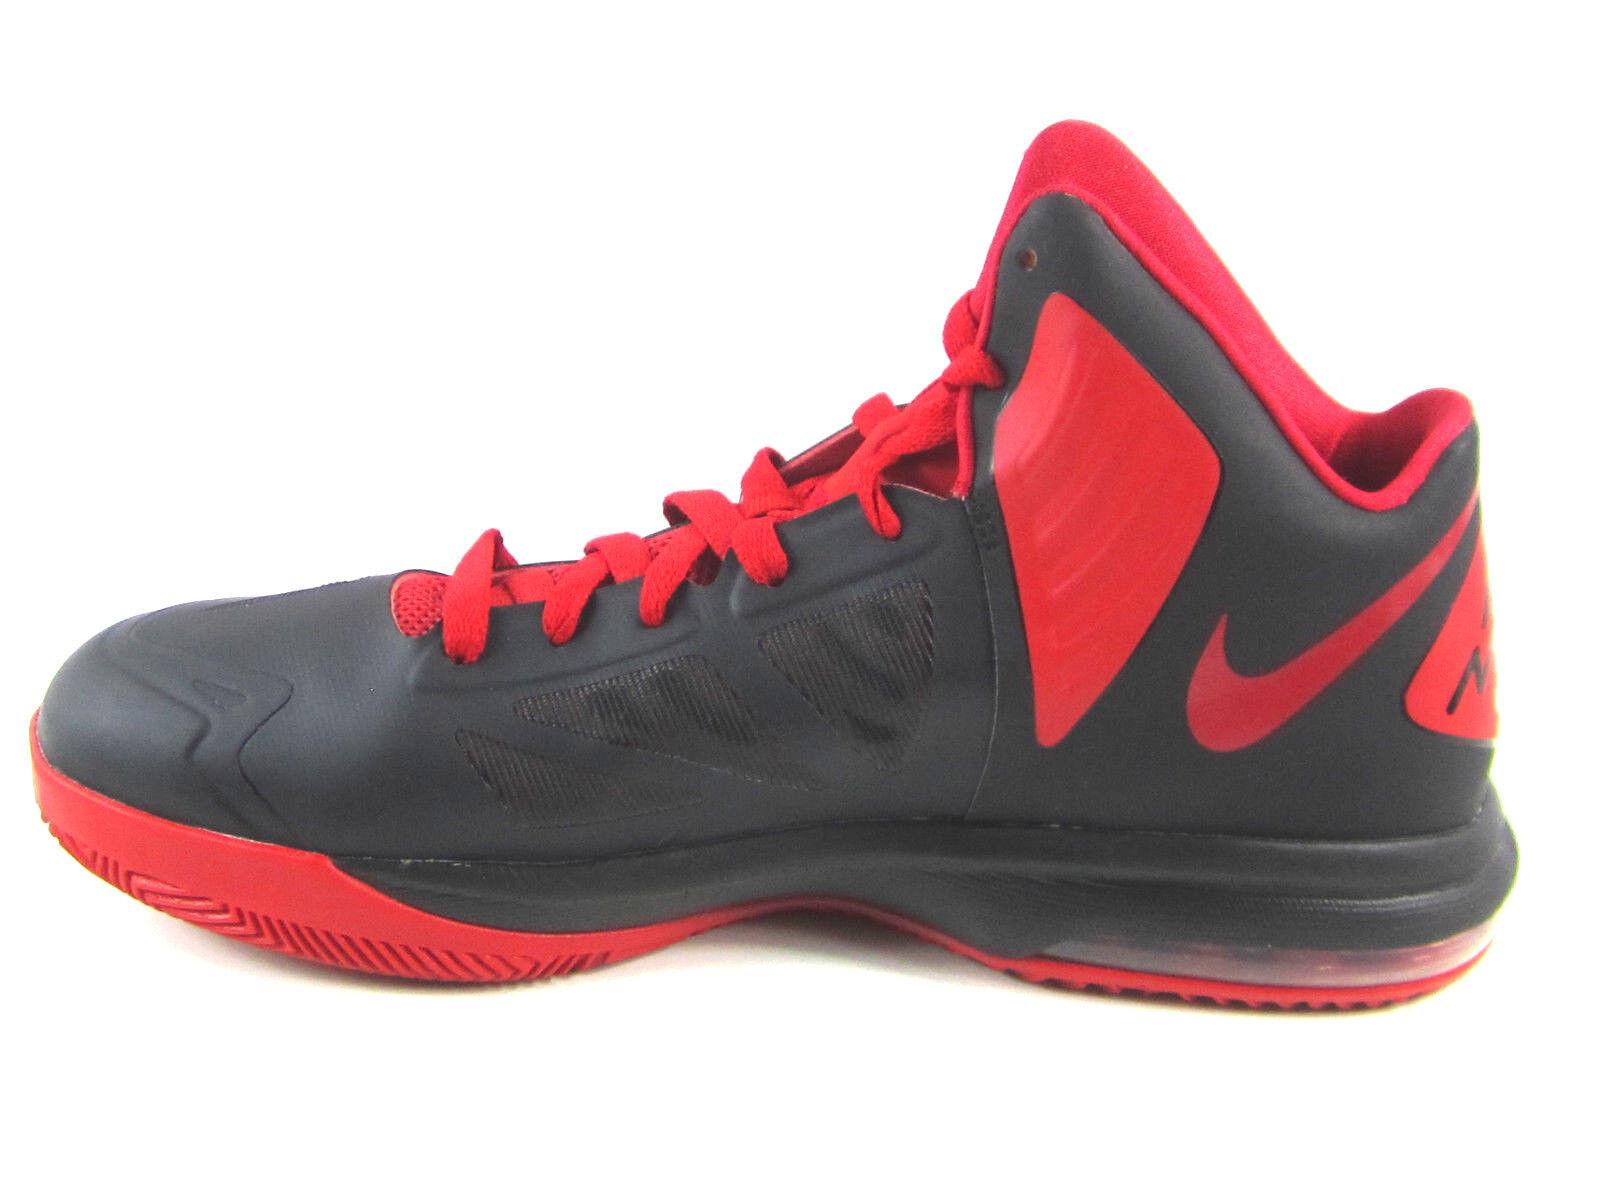 Nike air max hyperaggressor männer - basketball - us schuhe in größe 10 us - - 44 c2c573